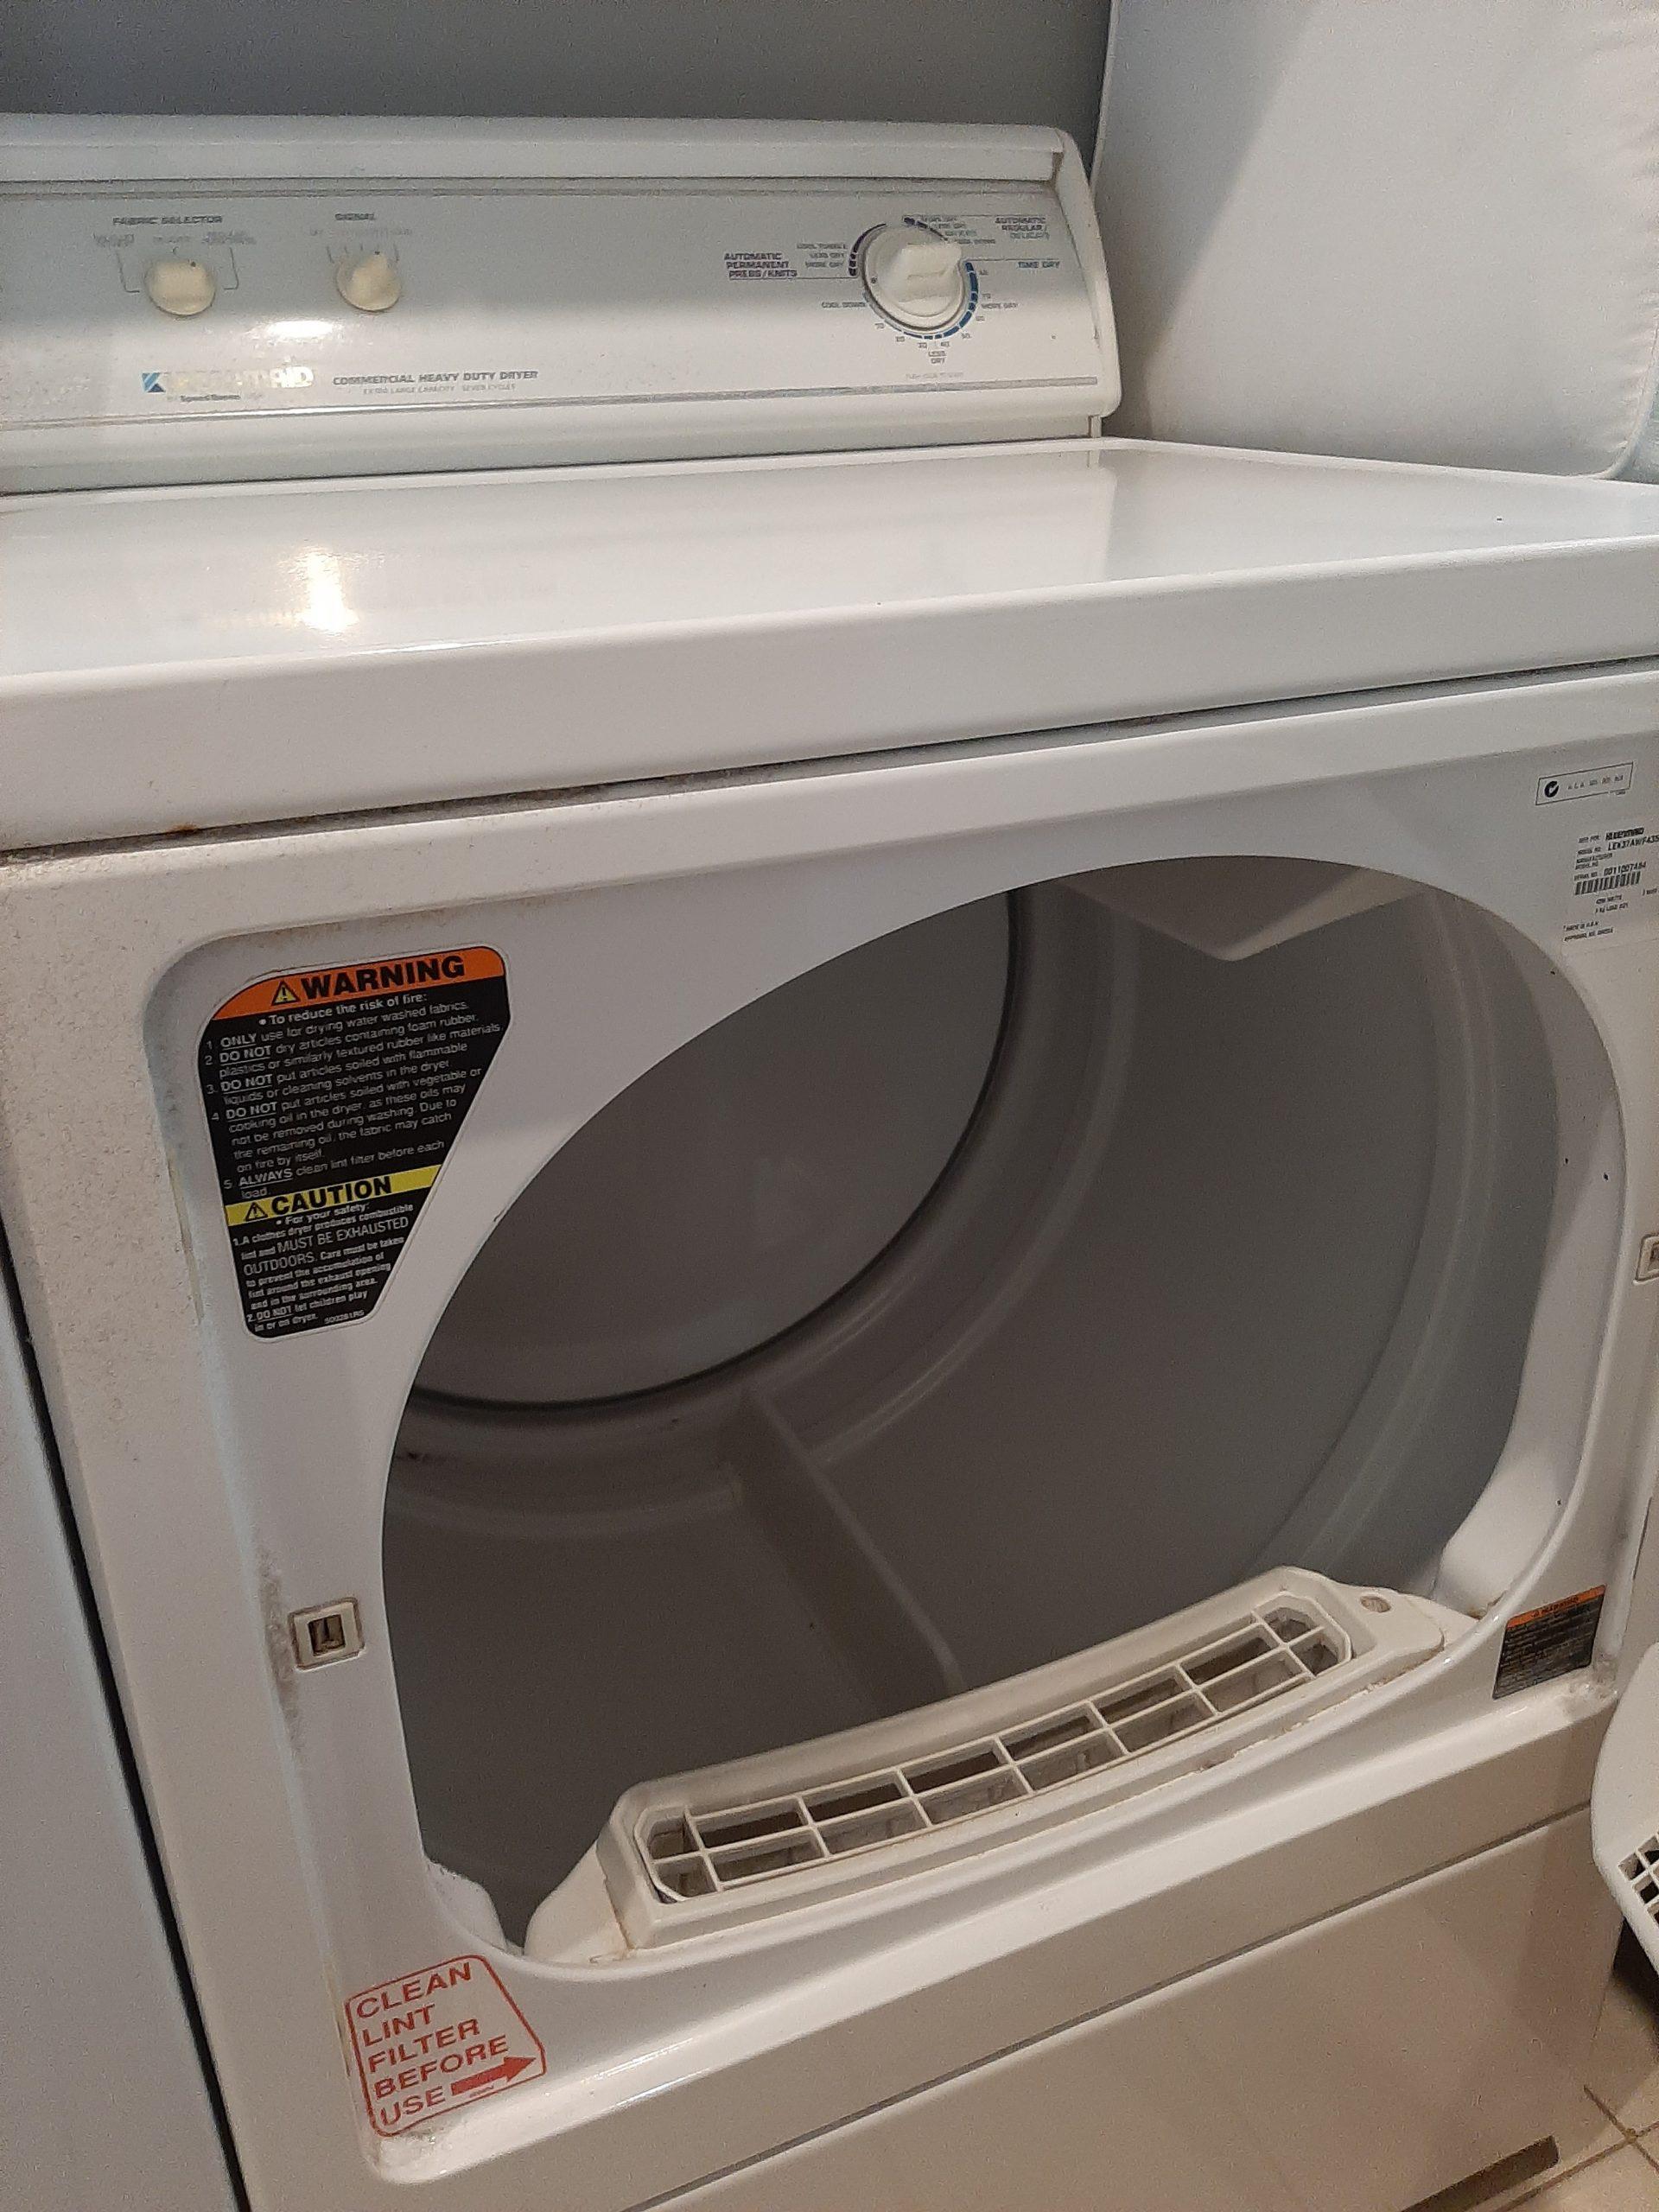 Large clothes dryer